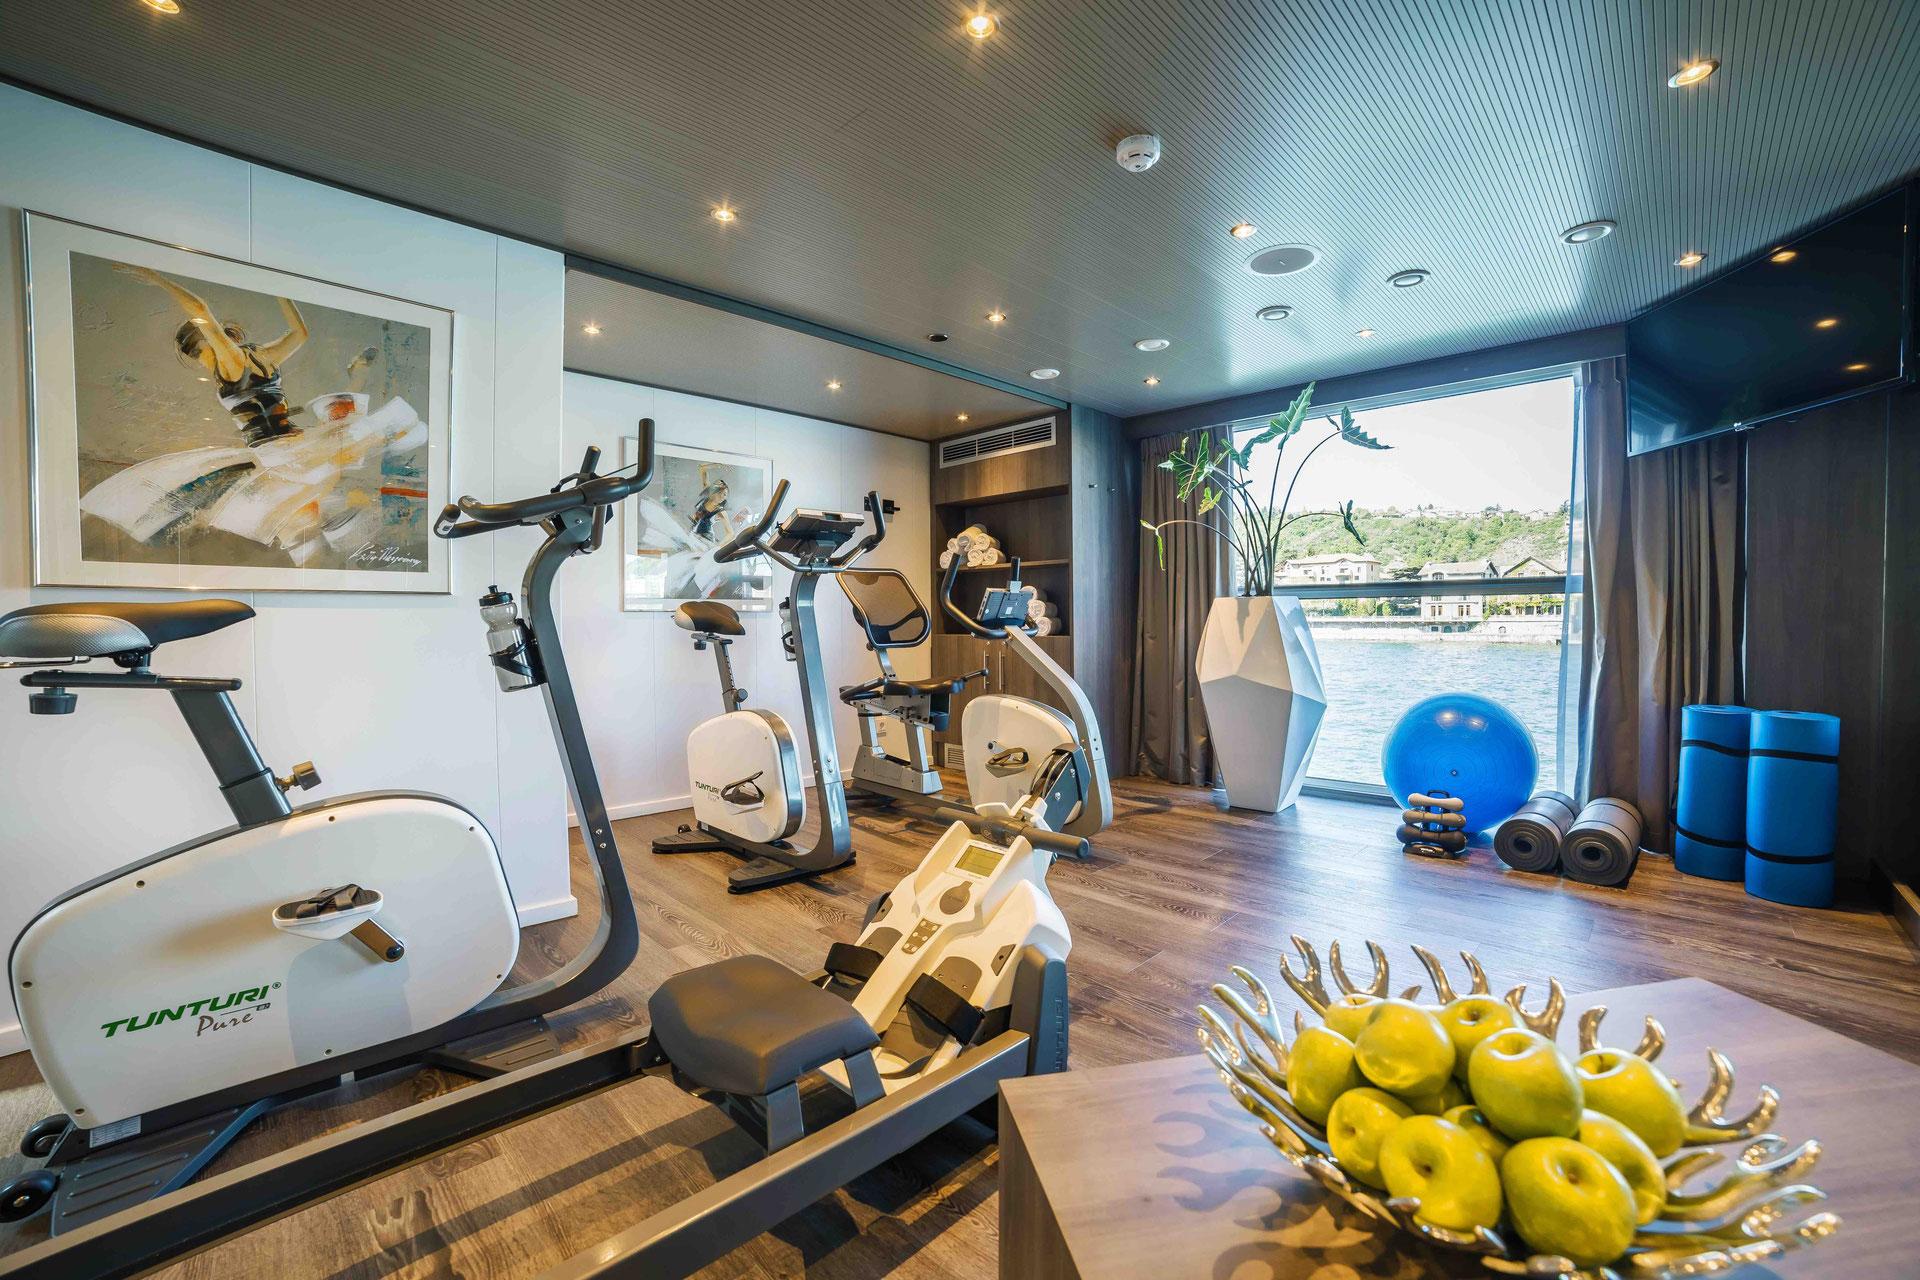 Amadeus Provence Fitnessraum